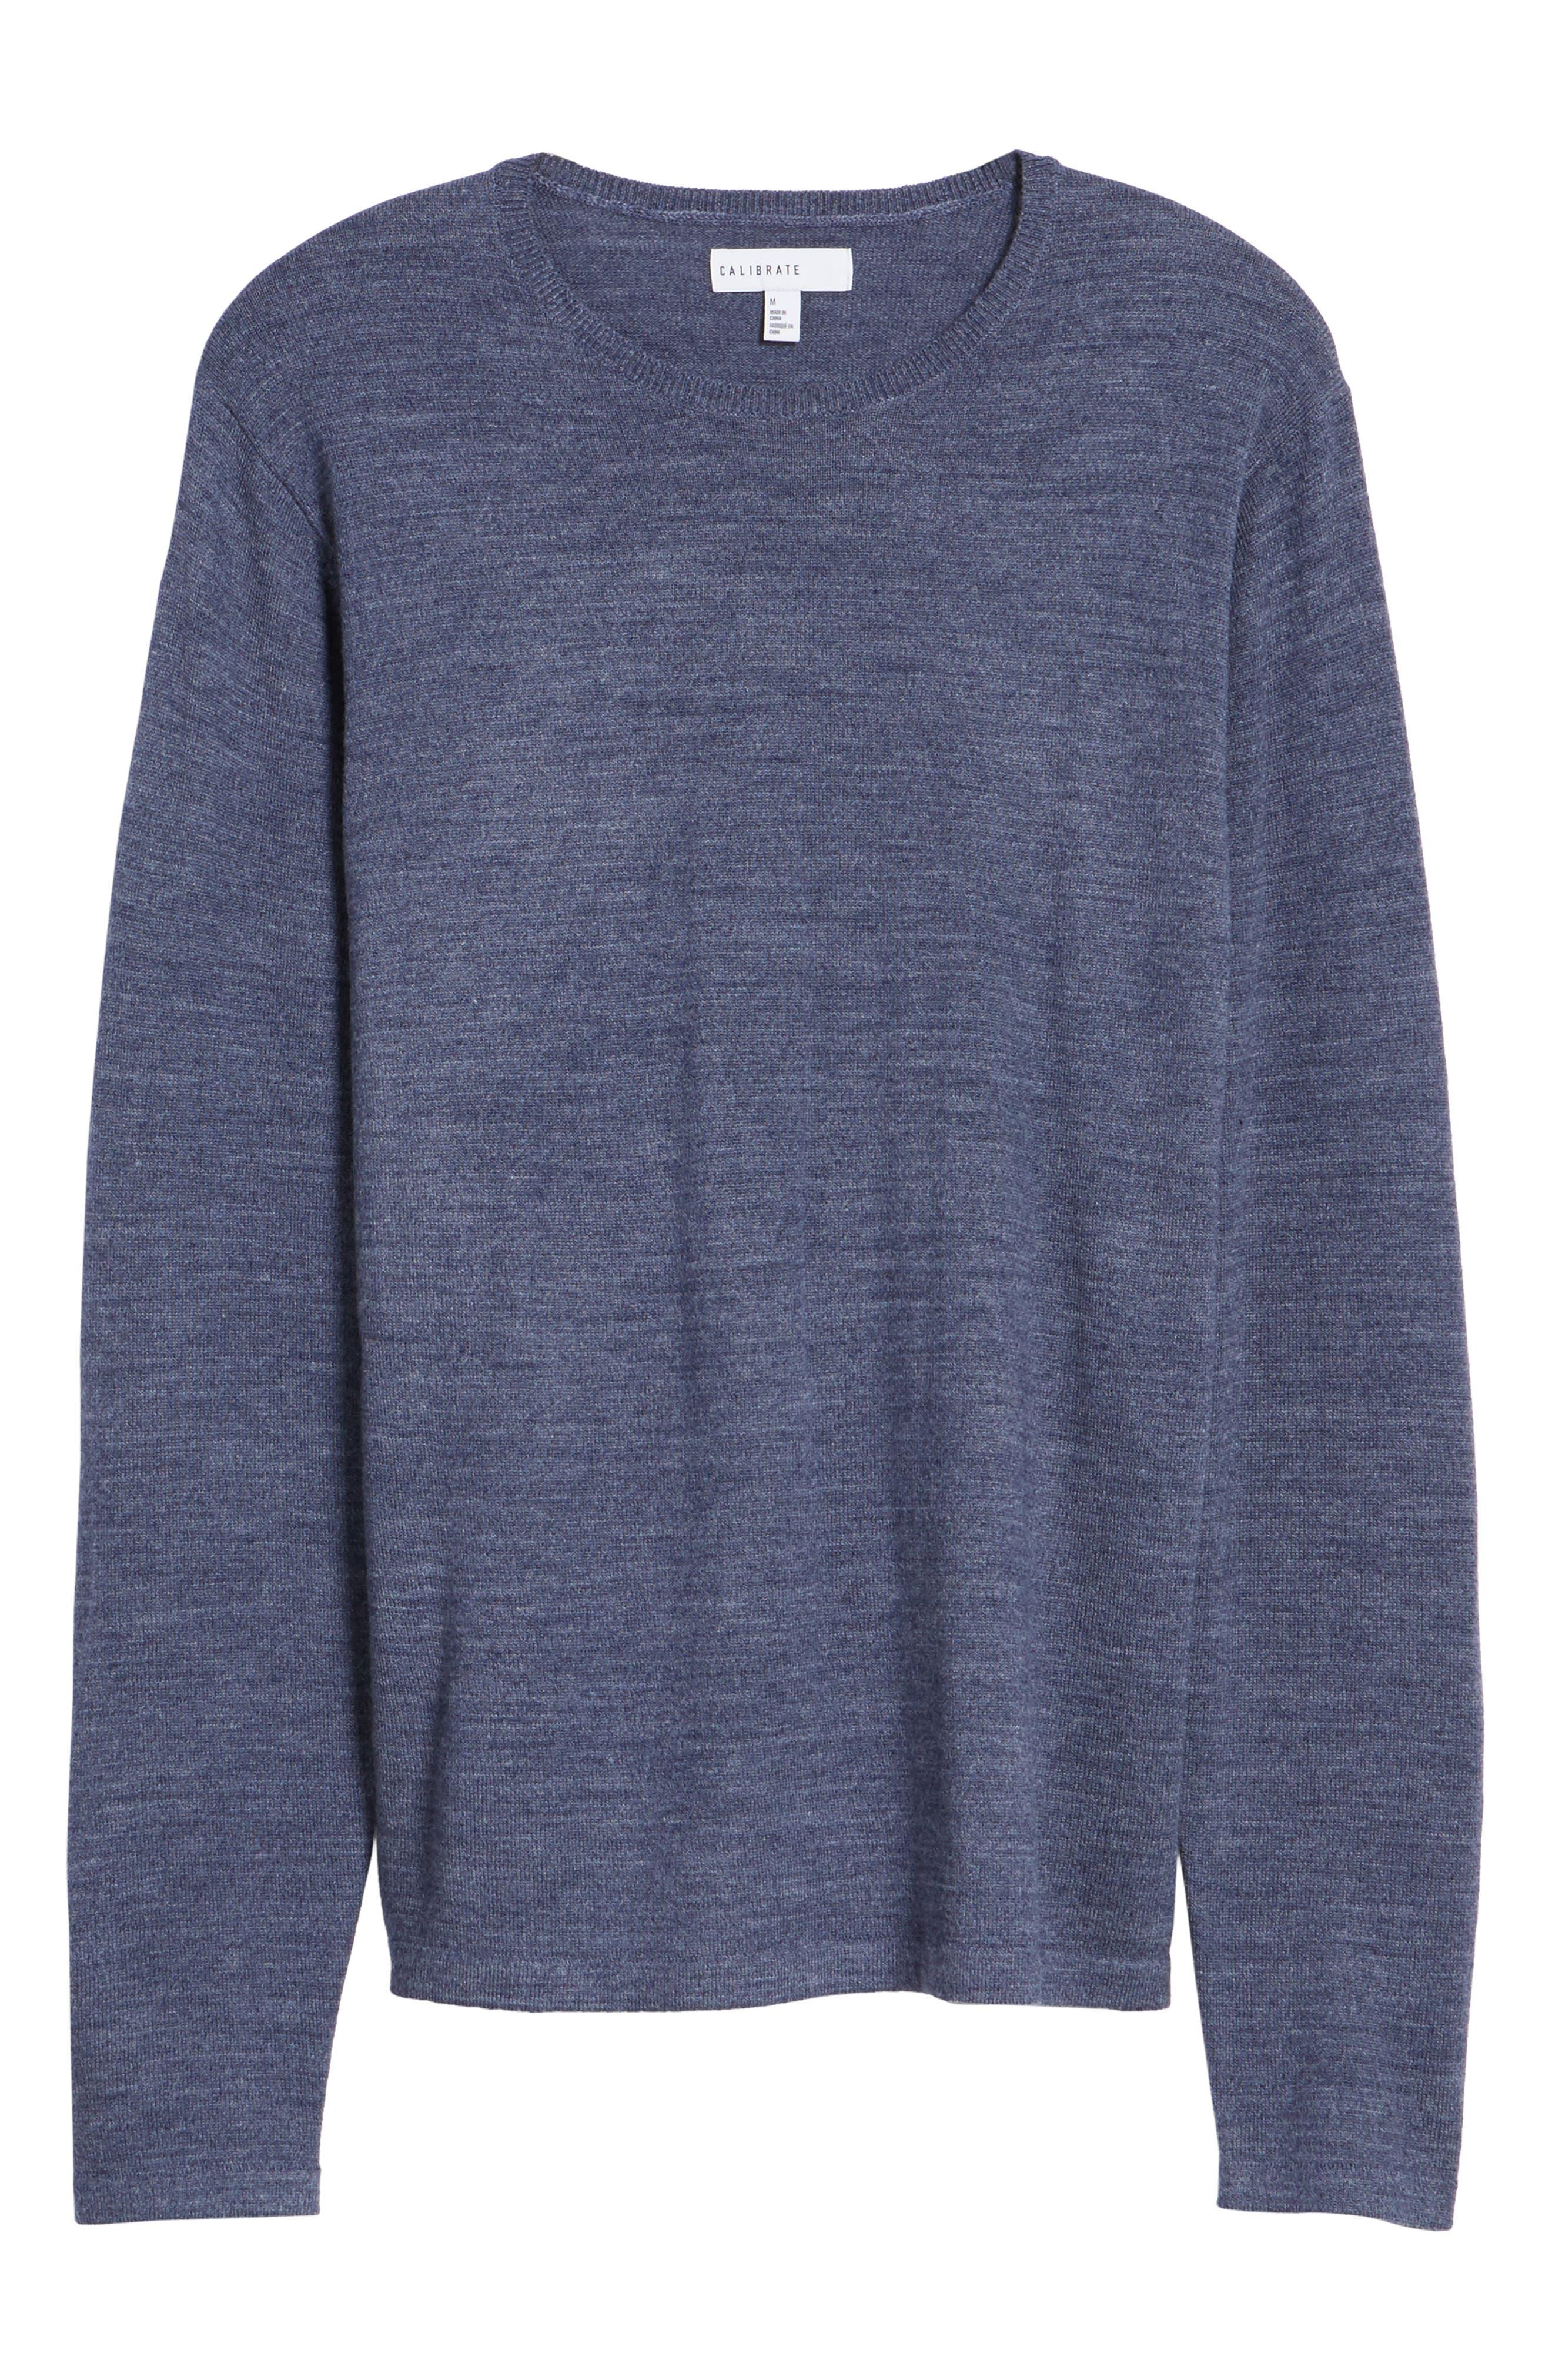 Merino Blend Crewneck Sweater,                             Alternate thumbnail 24, color,